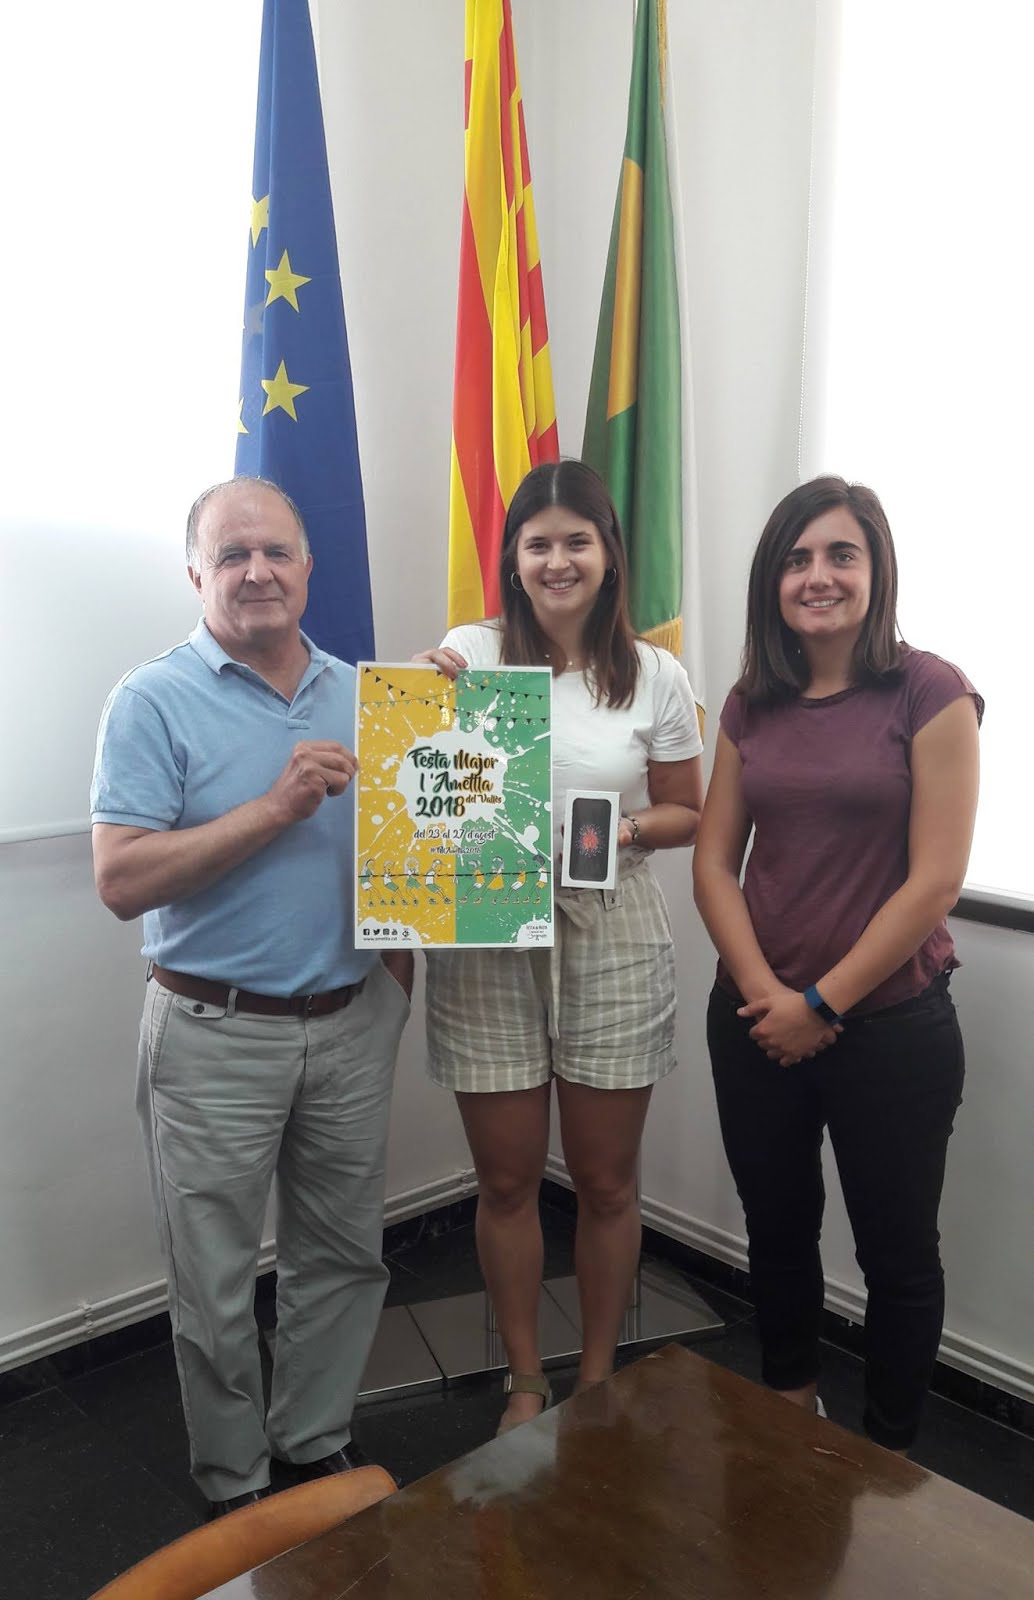 Cartell Festa Major l'Ametlla del Vallès 2018